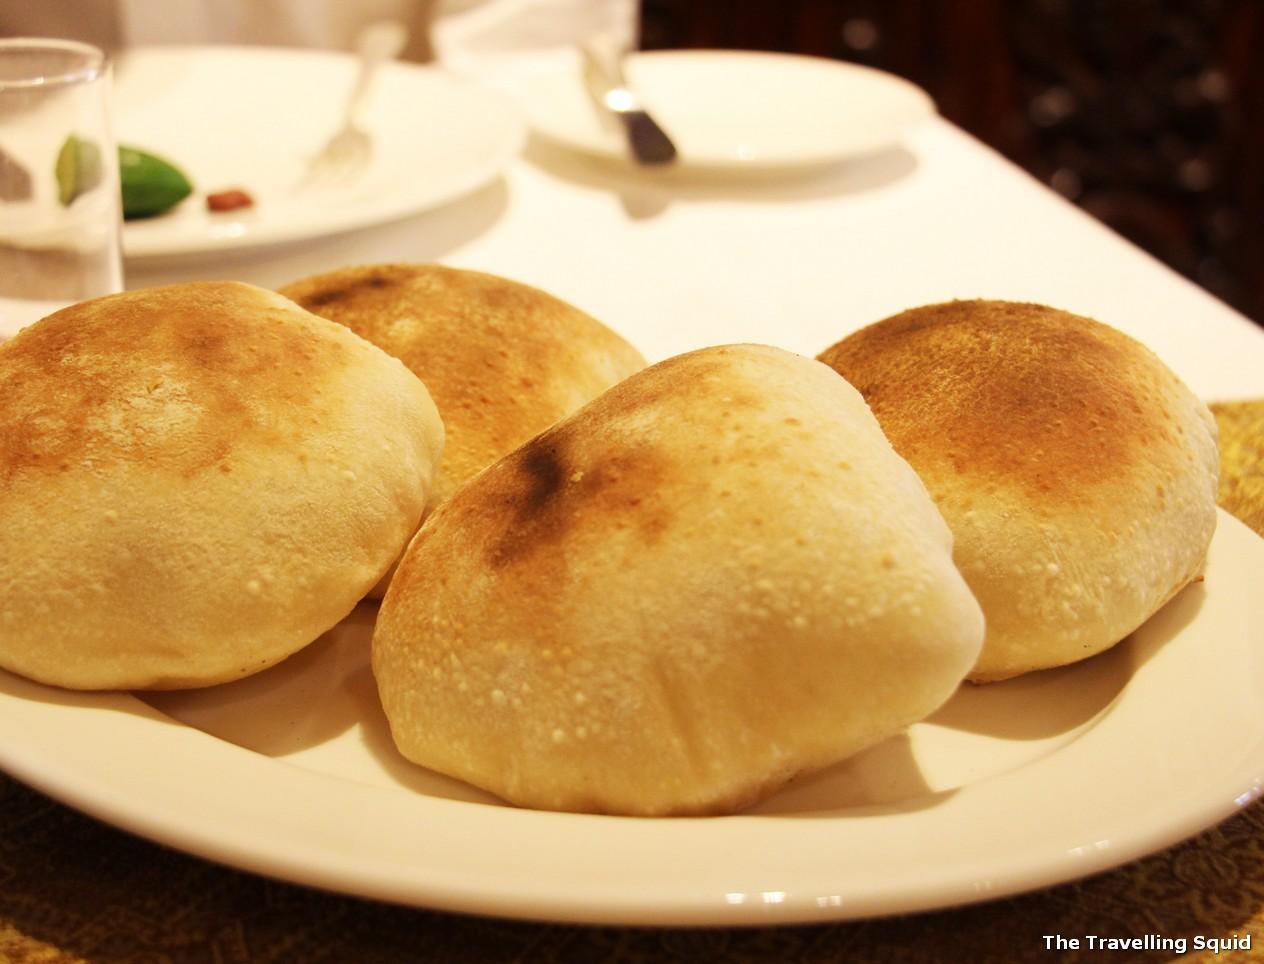 sabaya intercontinental cairo lebanese pita bread